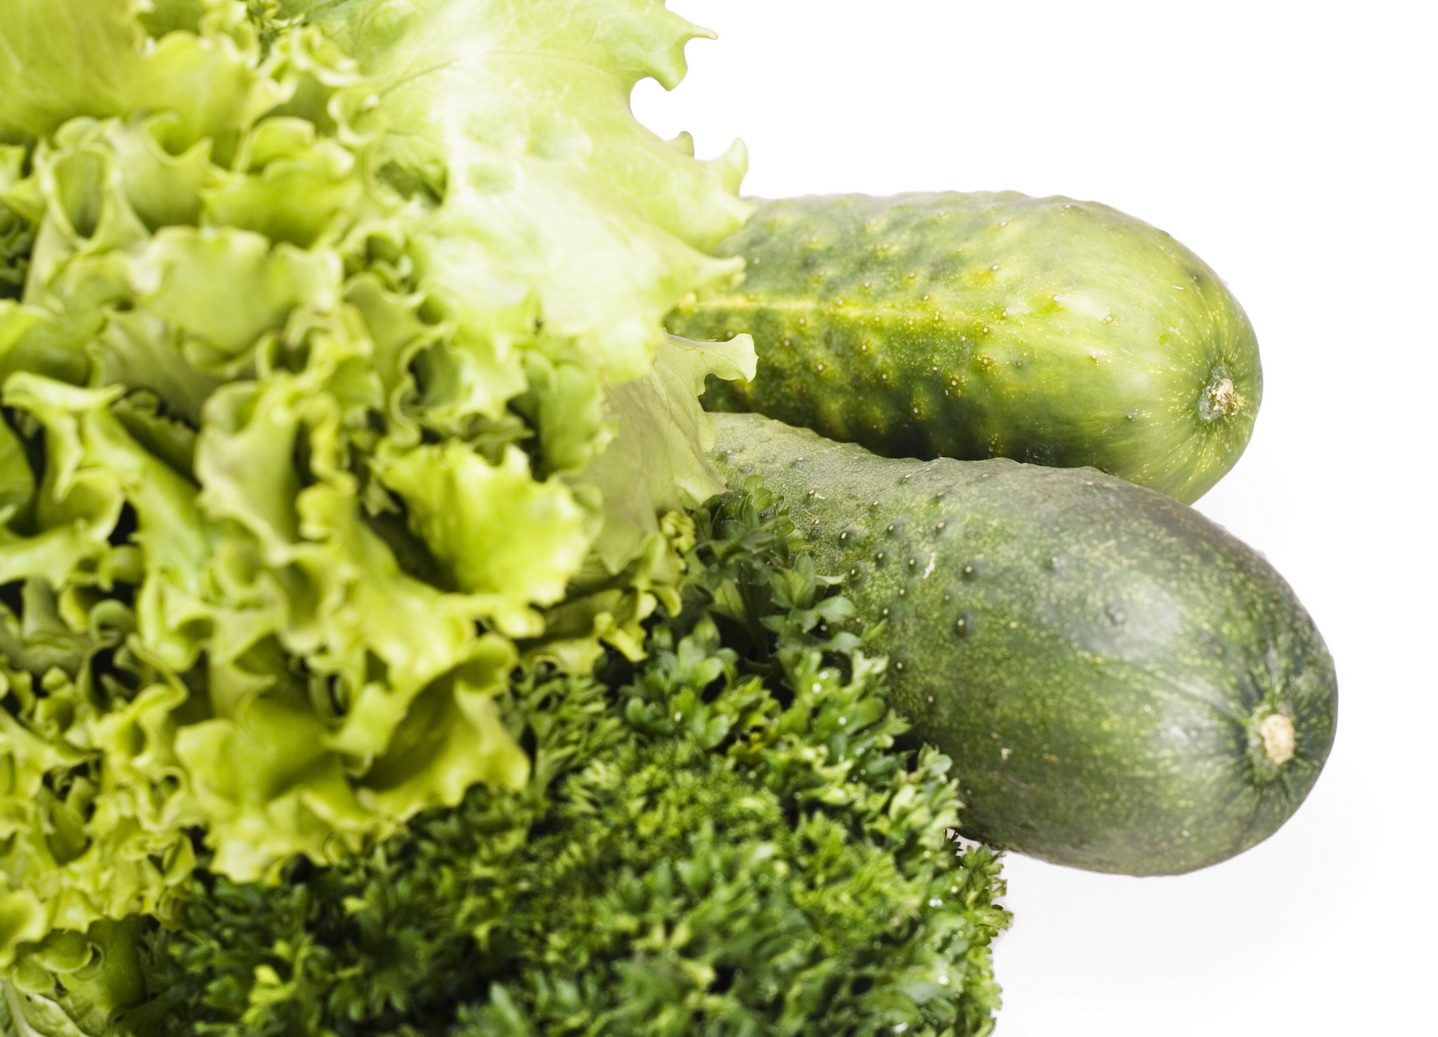 herbs, Diet, Nutrition, Vegetable, Texture, HQ Photo